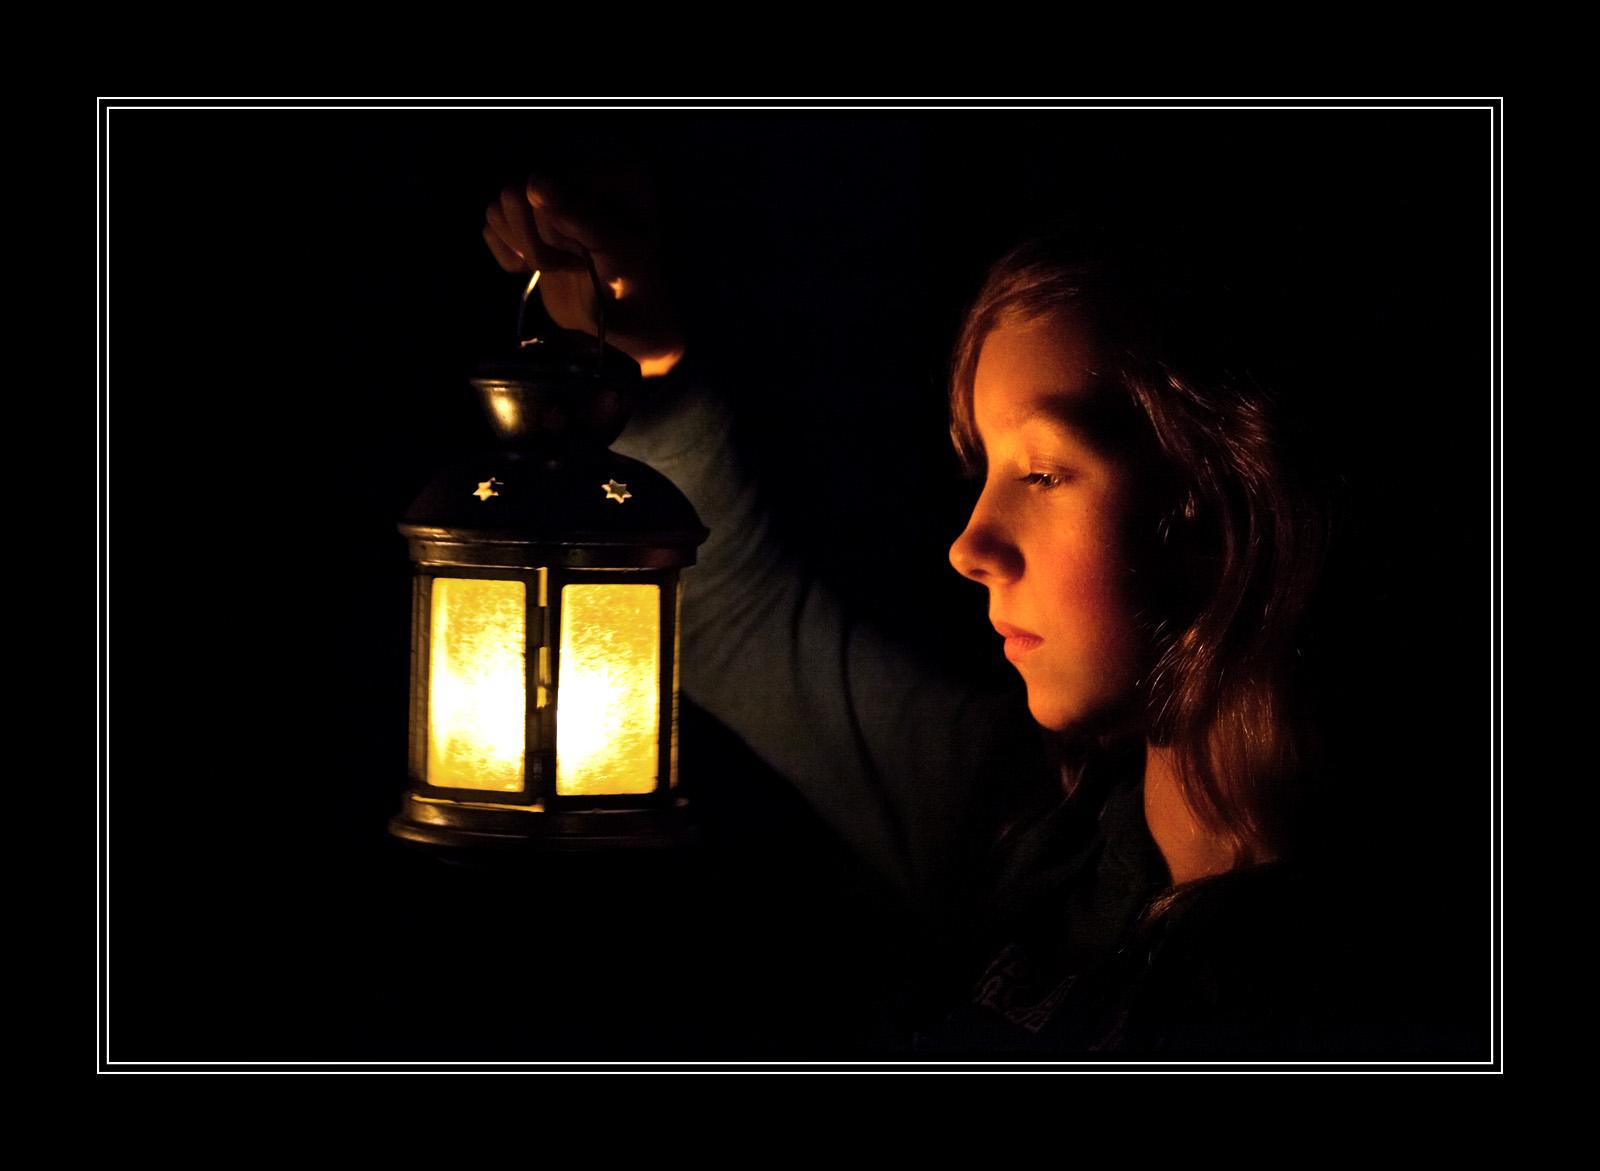 & Gavtrain - Photography Training: How high is too high?